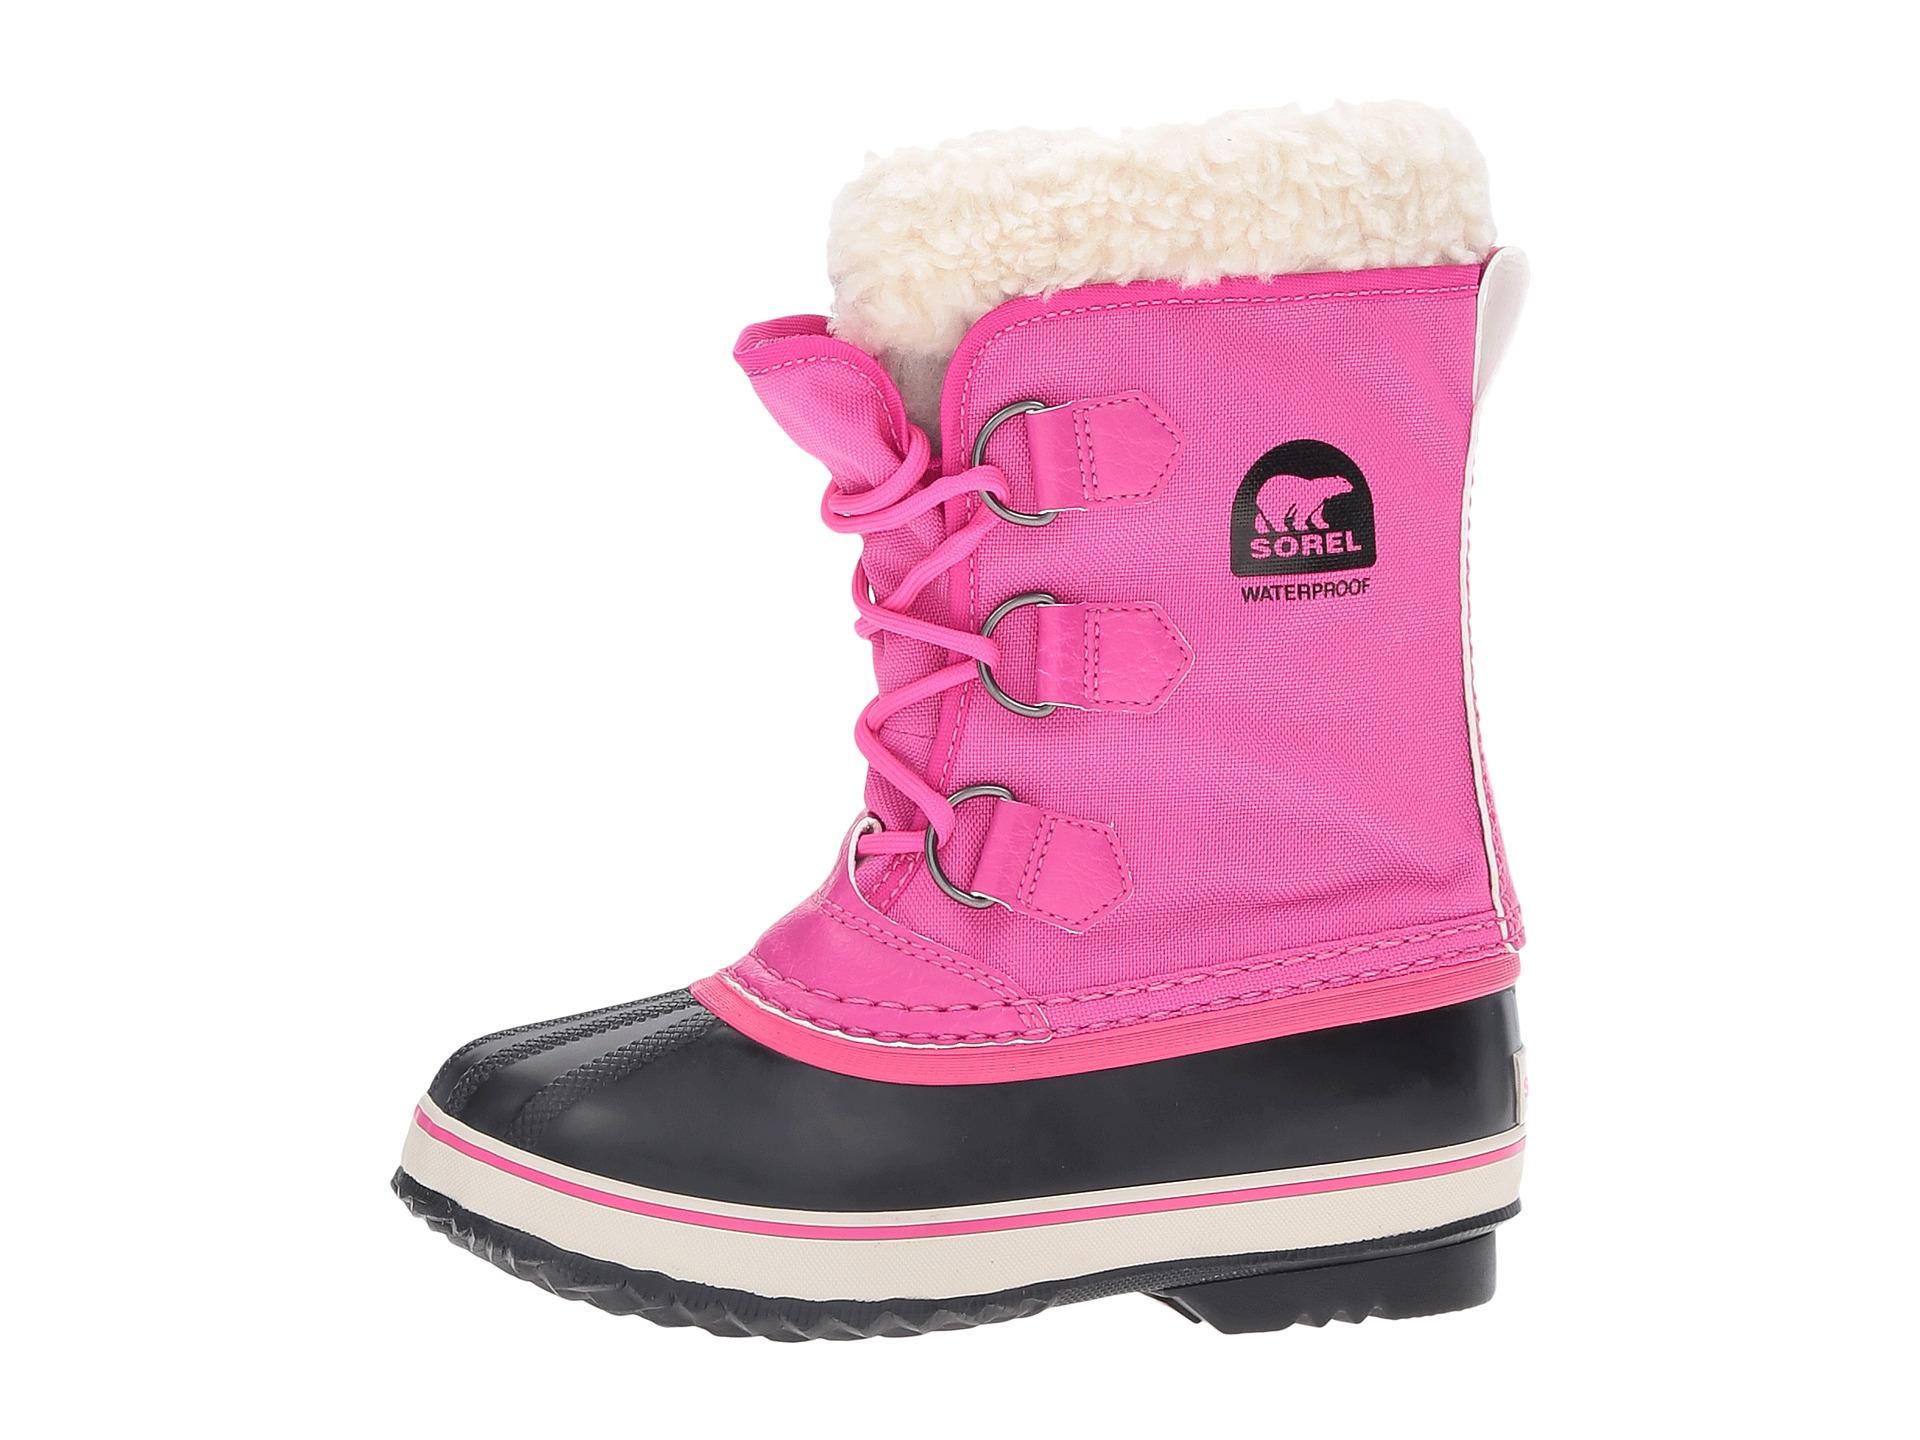 sorel yoot pac snow boots purple mount mercy